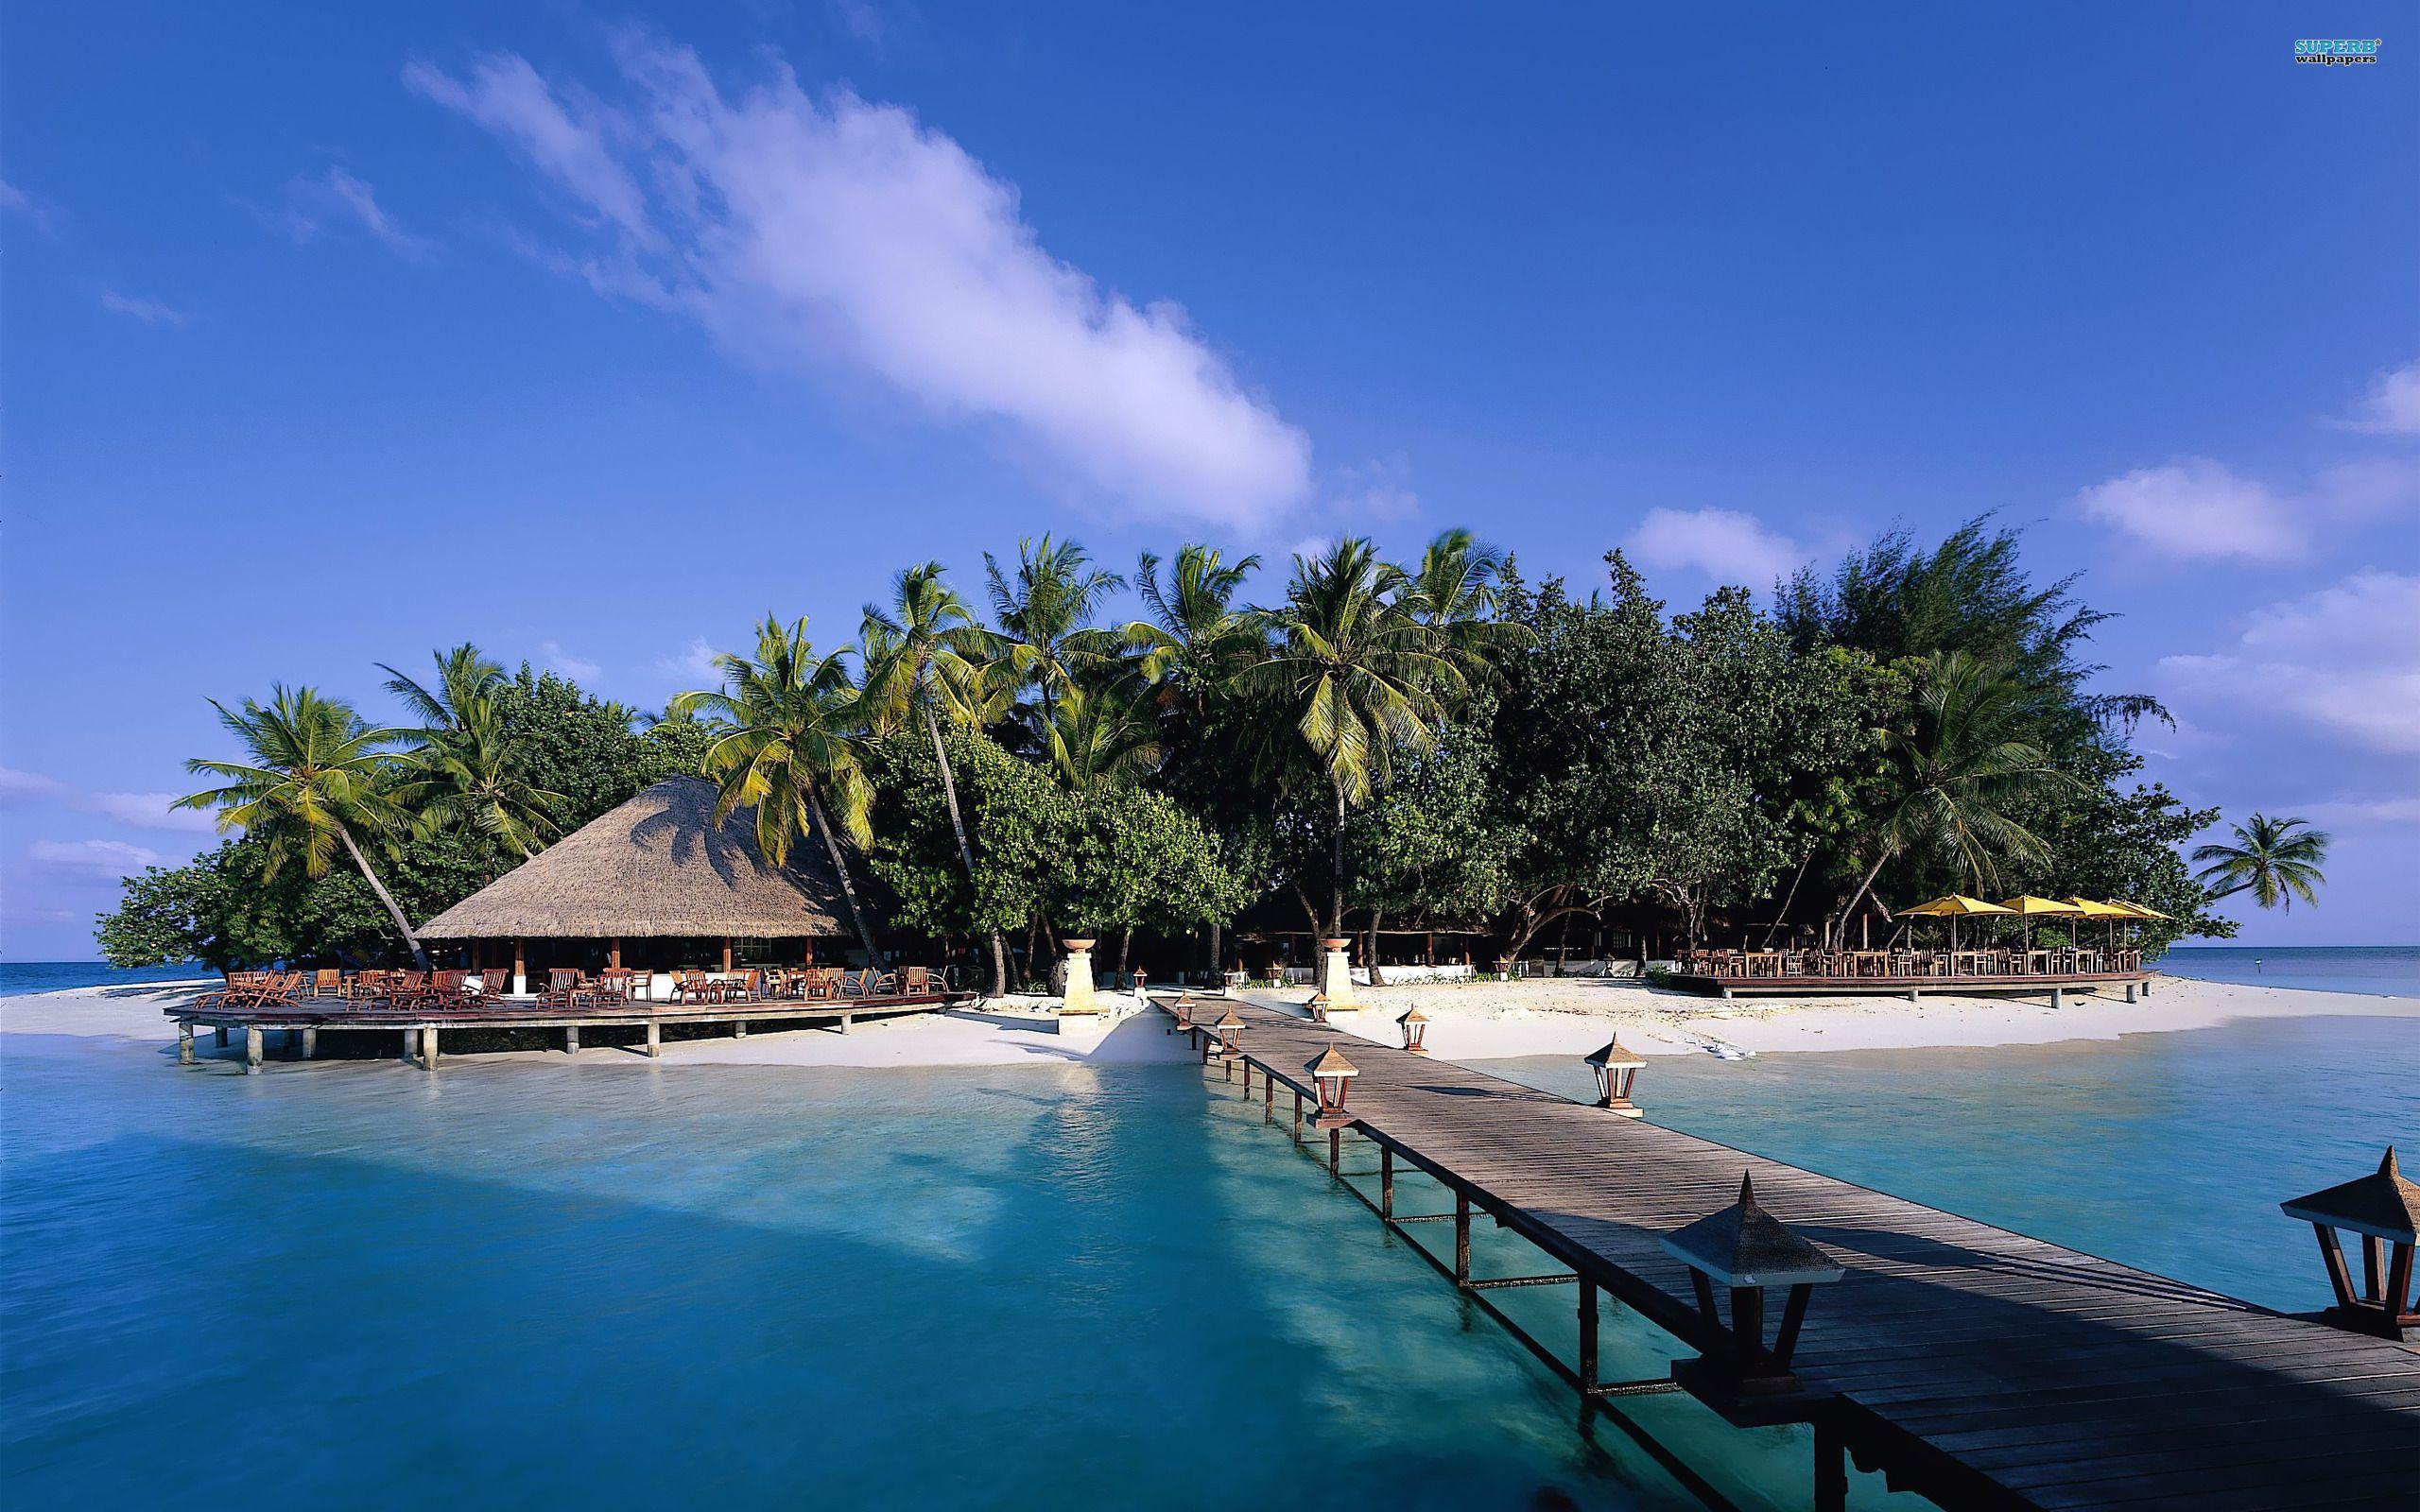 Maldives Beach 4K Wallpapers   Wide Screen Wallpaper 1080p ...